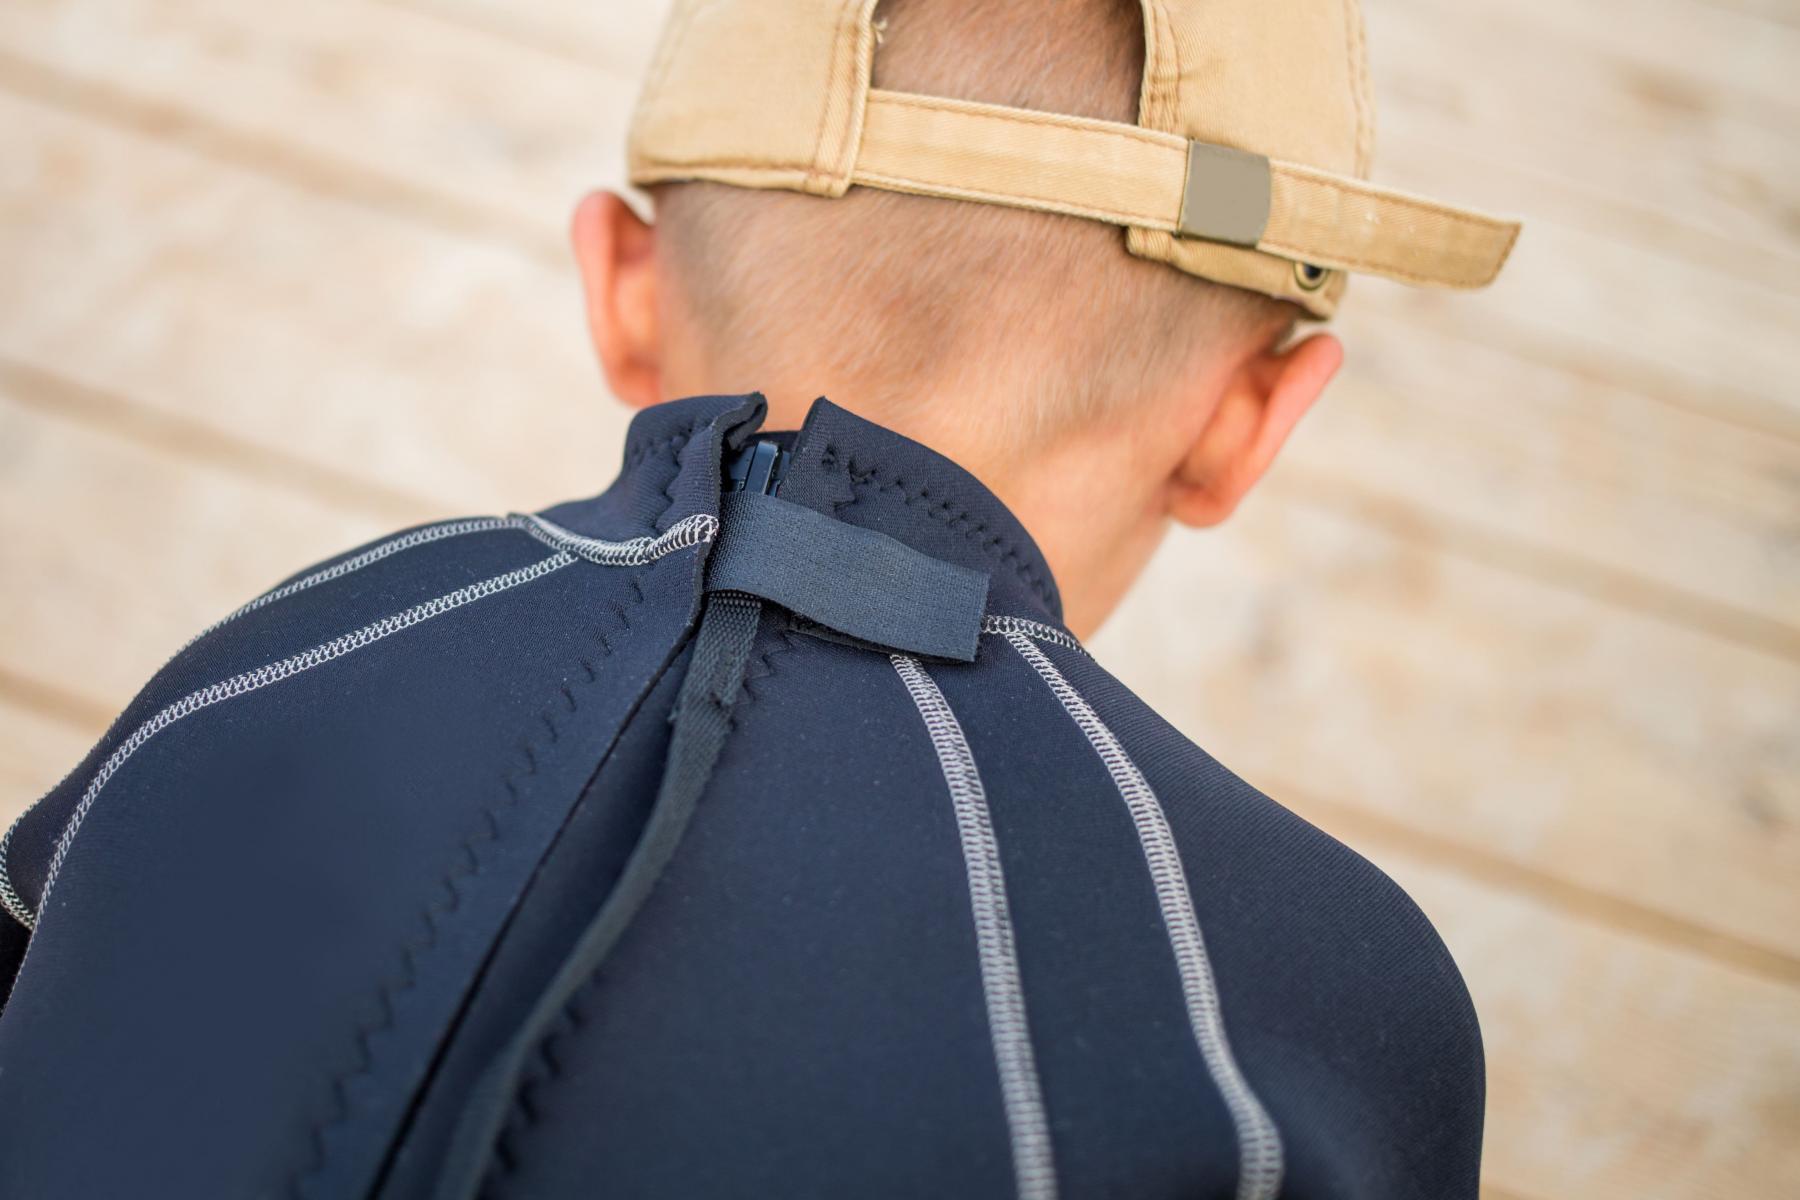 Back zipper of a wetsuit